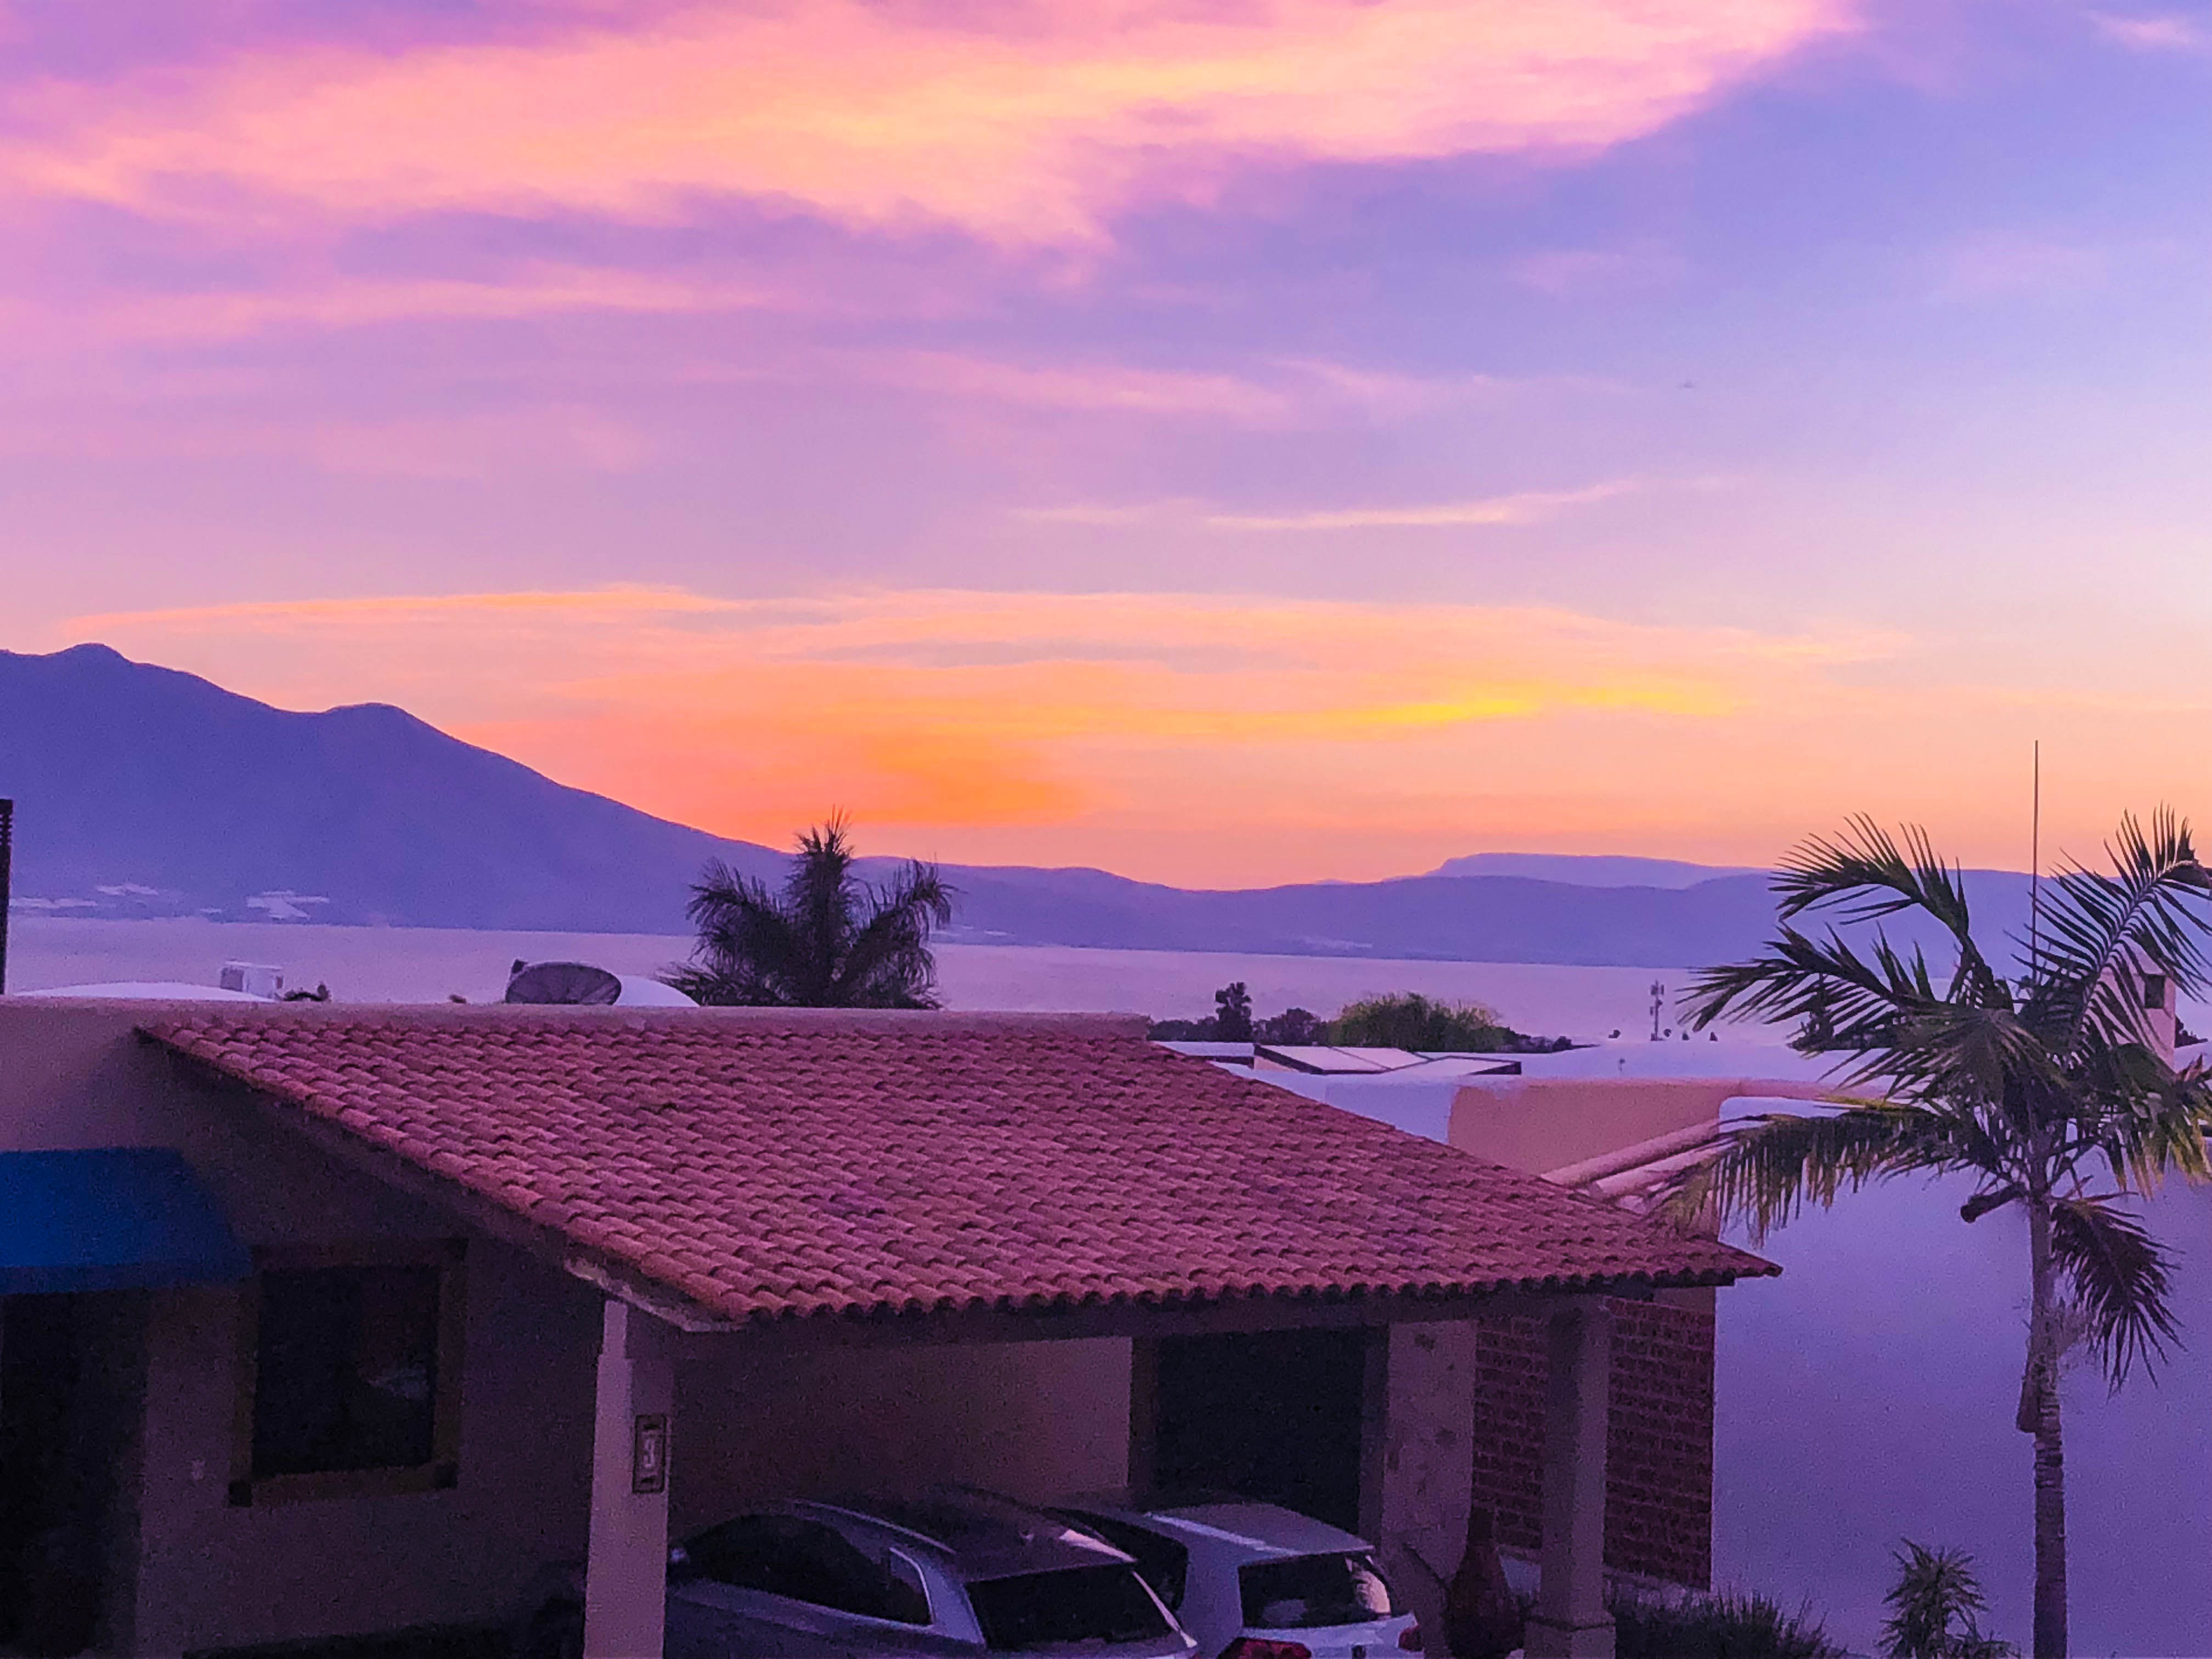 sunset-0351